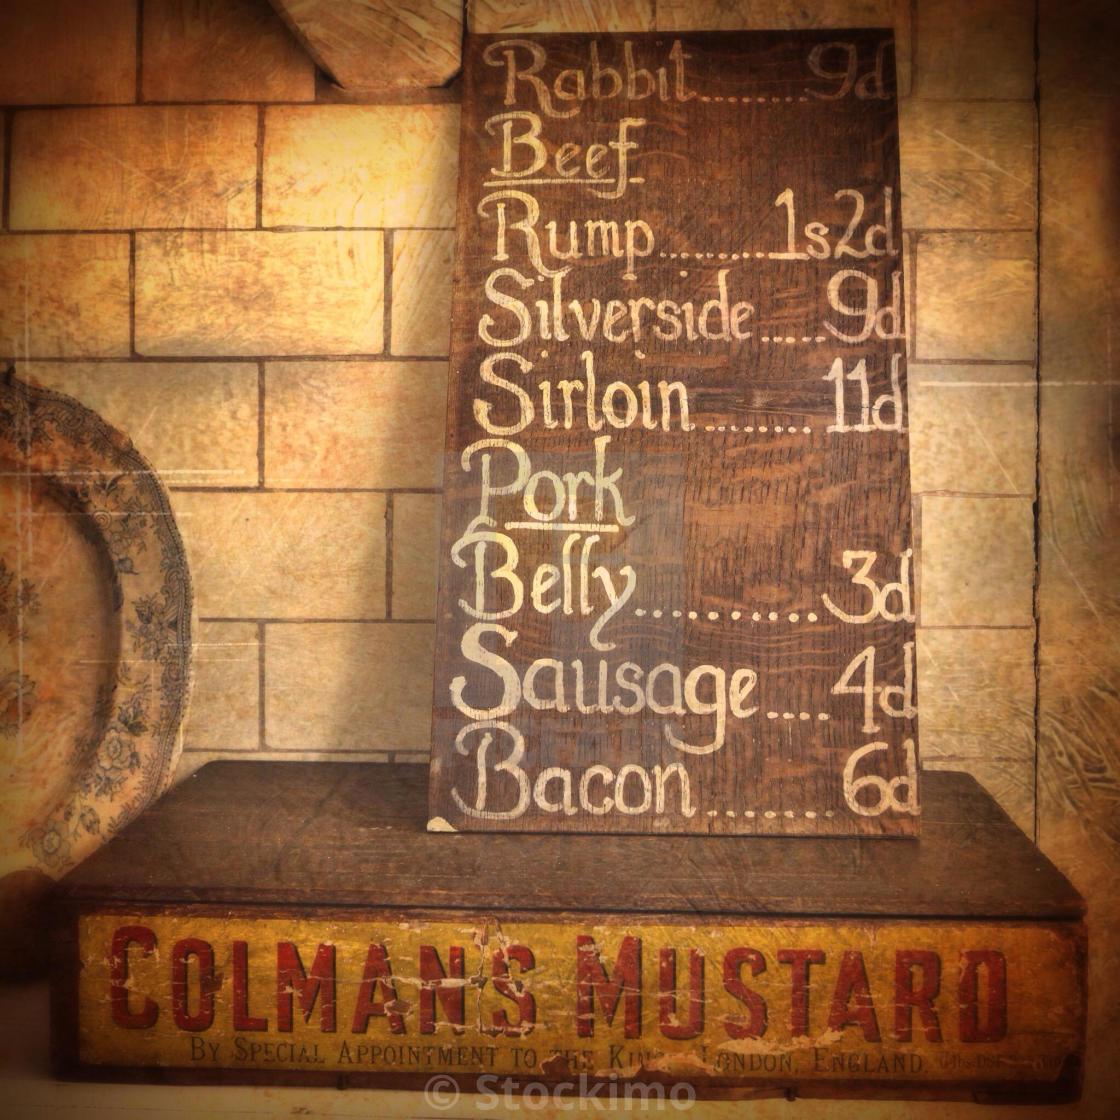 Price list in old money, butcher's shop, Blist's Hill